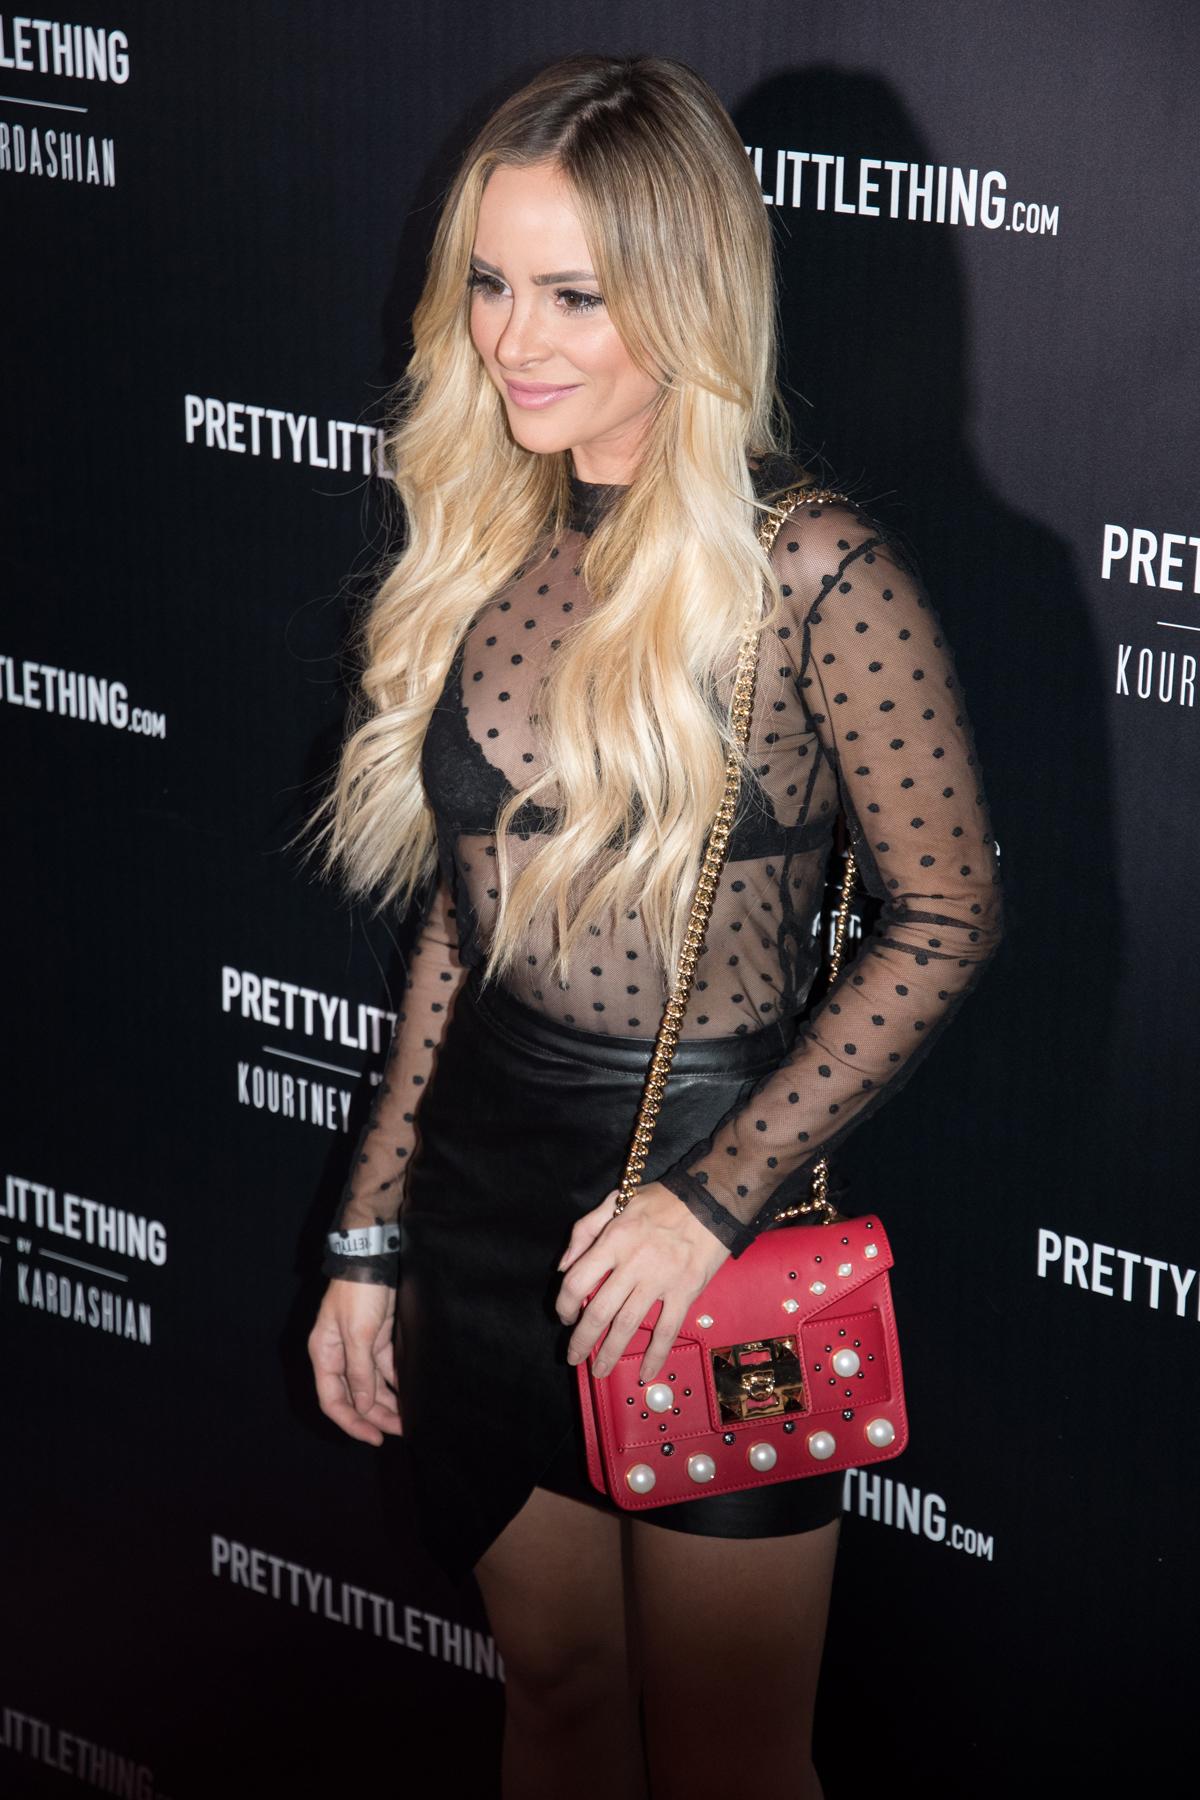 PrettyLittleThing PLT X Kourtney Kardashian Collection Celebrity Launch Party Amanda Stanton.jpg